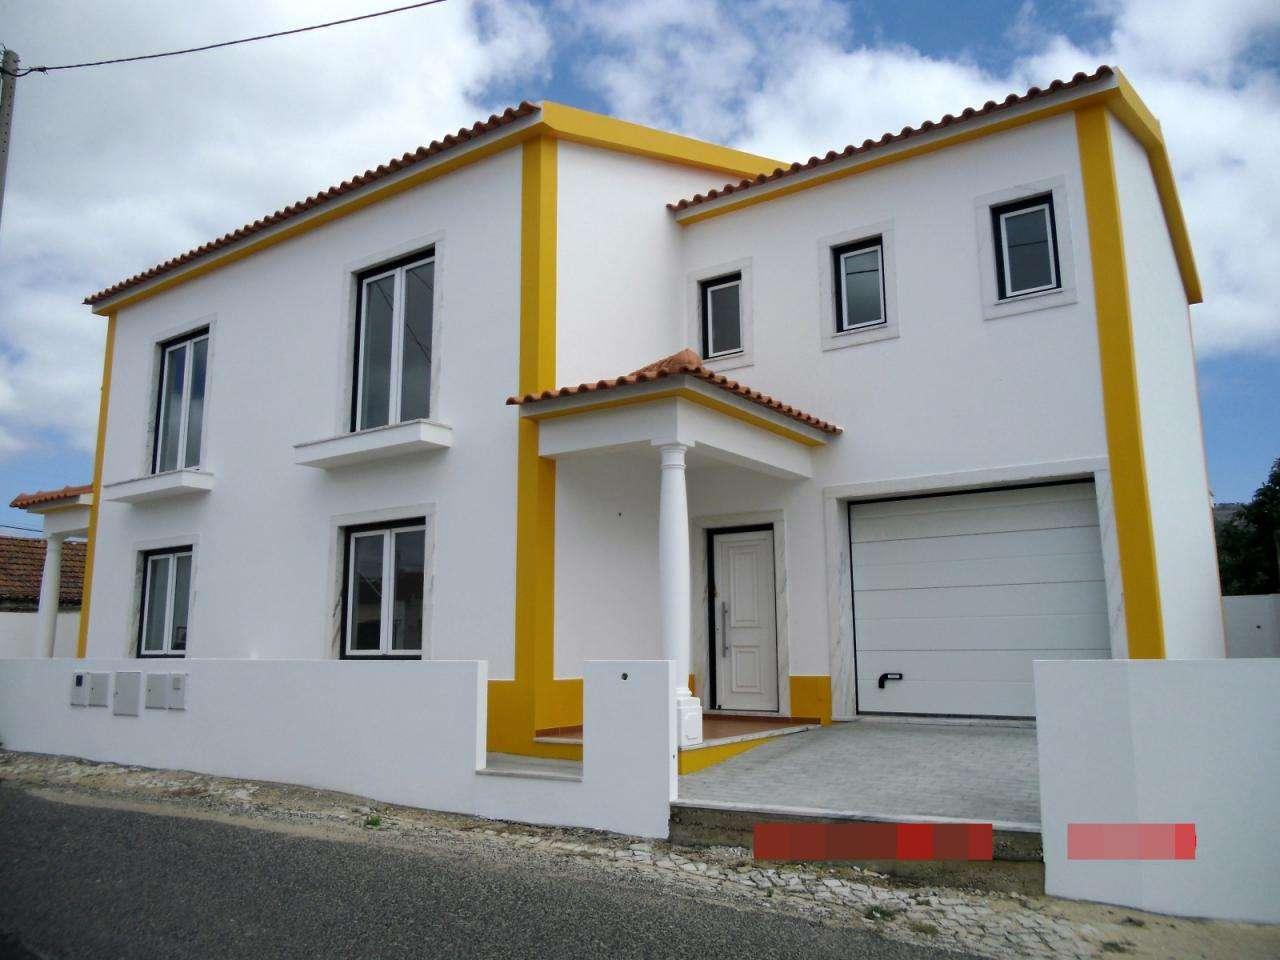 Moradia para comprar, Vilar, Cadaval, Lisboa - Foto 1